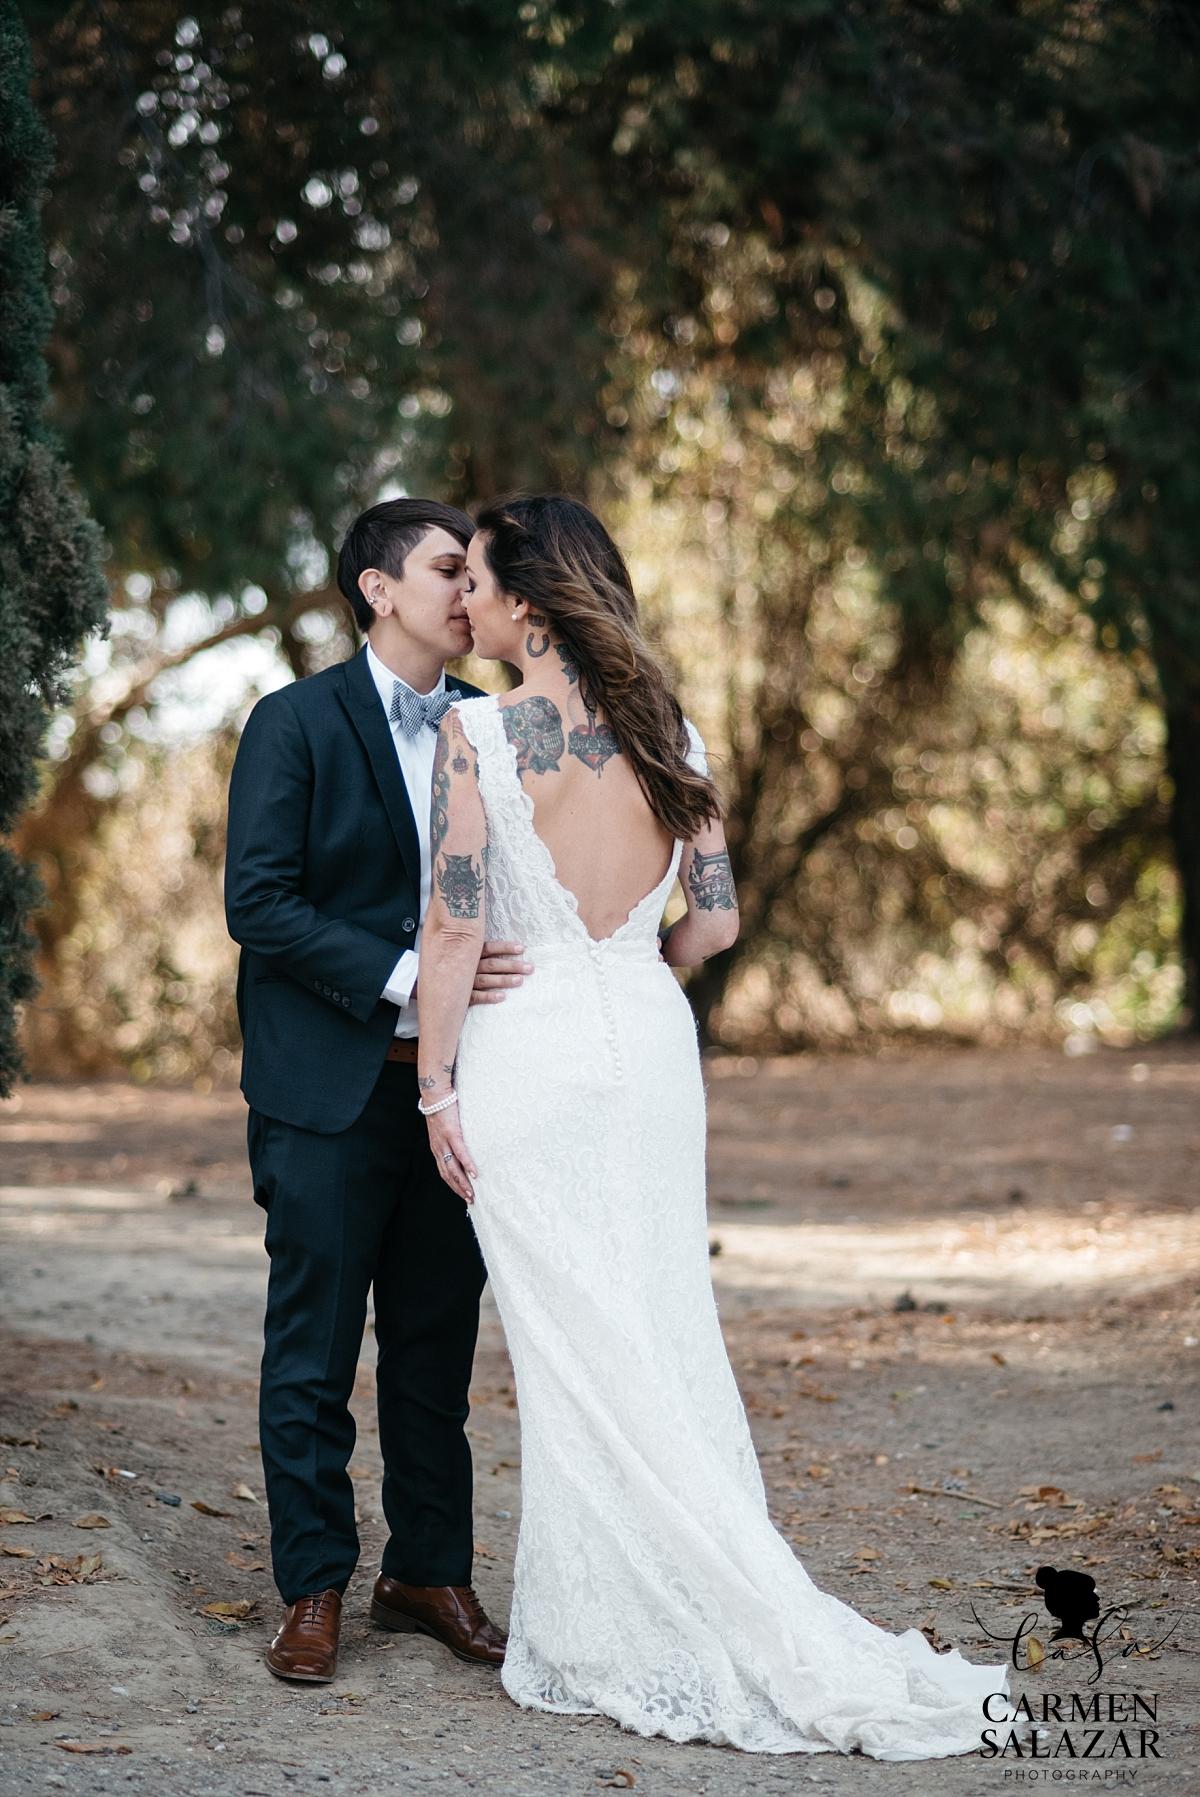 LGBTQ California alternative wedding fashion - Carmen Salazar